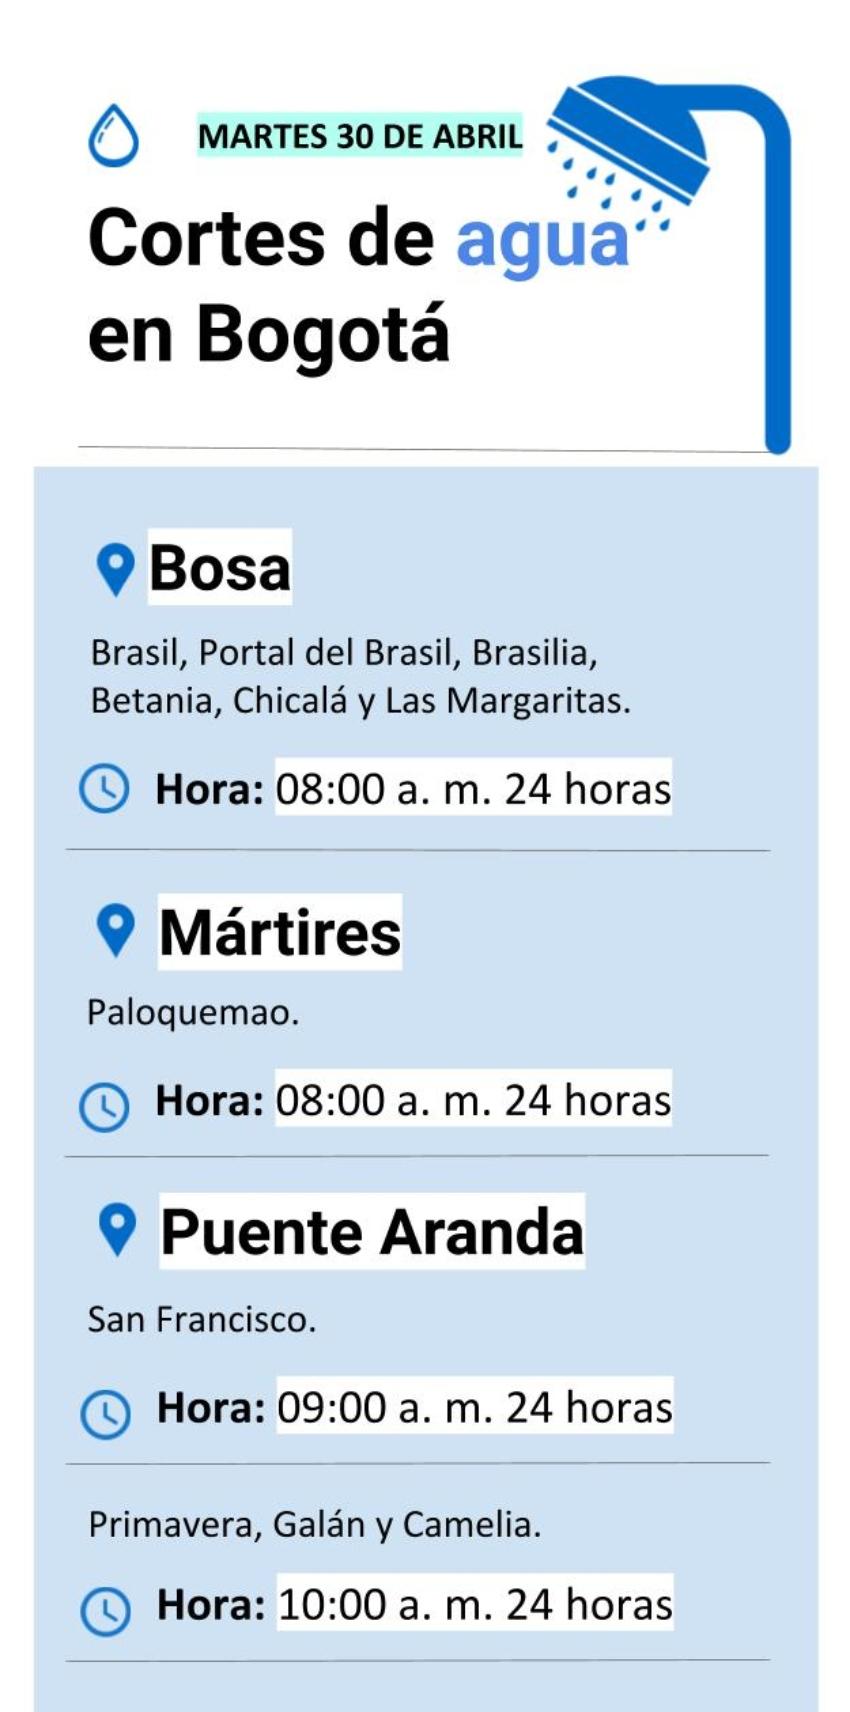 Cortes de agua en Bogotá martes 30 de abril